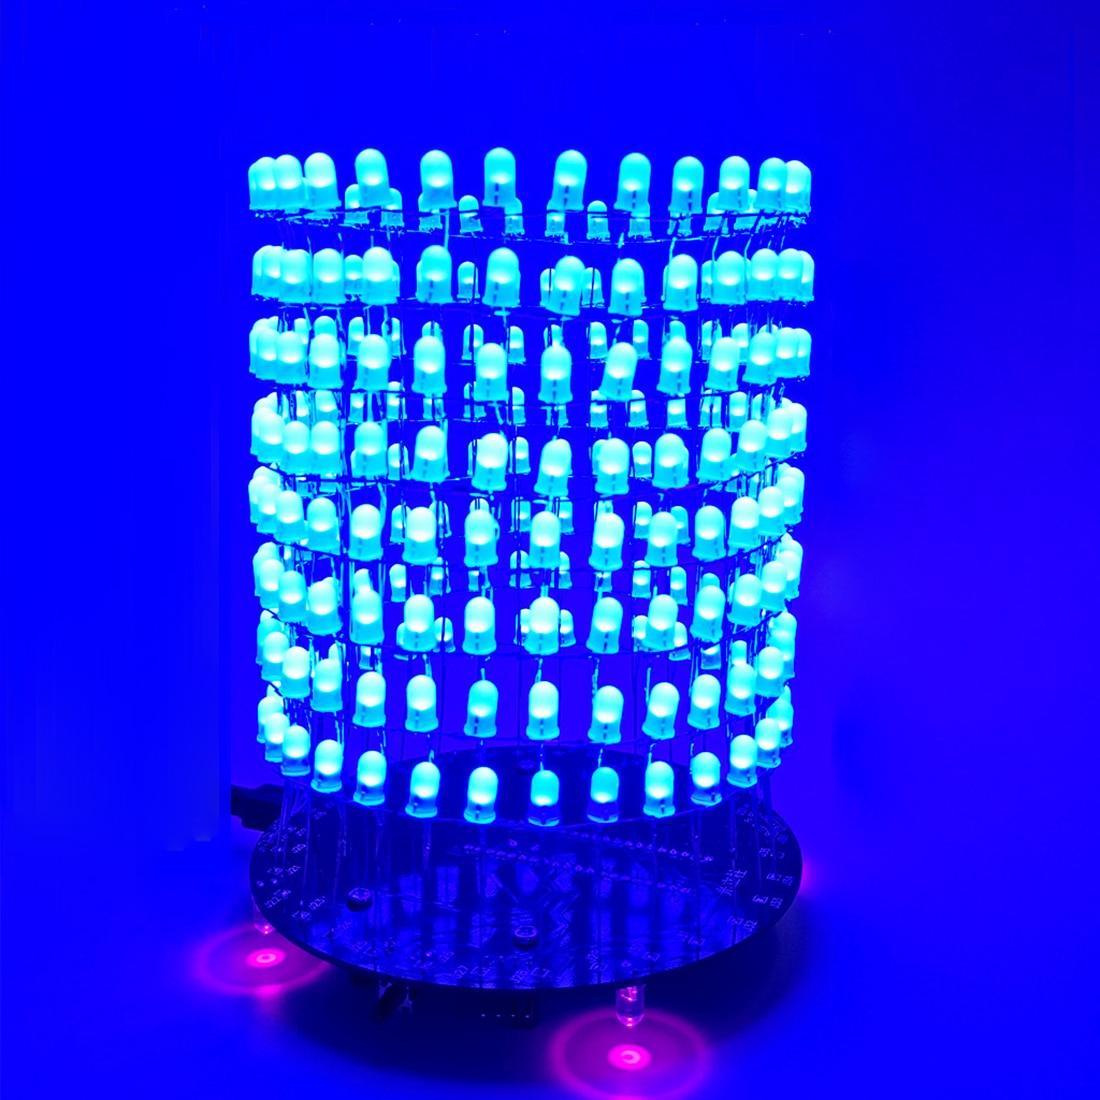 Round Audio Spectrum Light Column DIY Welding Light Cube DIY Lamp Brain-Training Toy For Children Educational Toys Birthday Gift